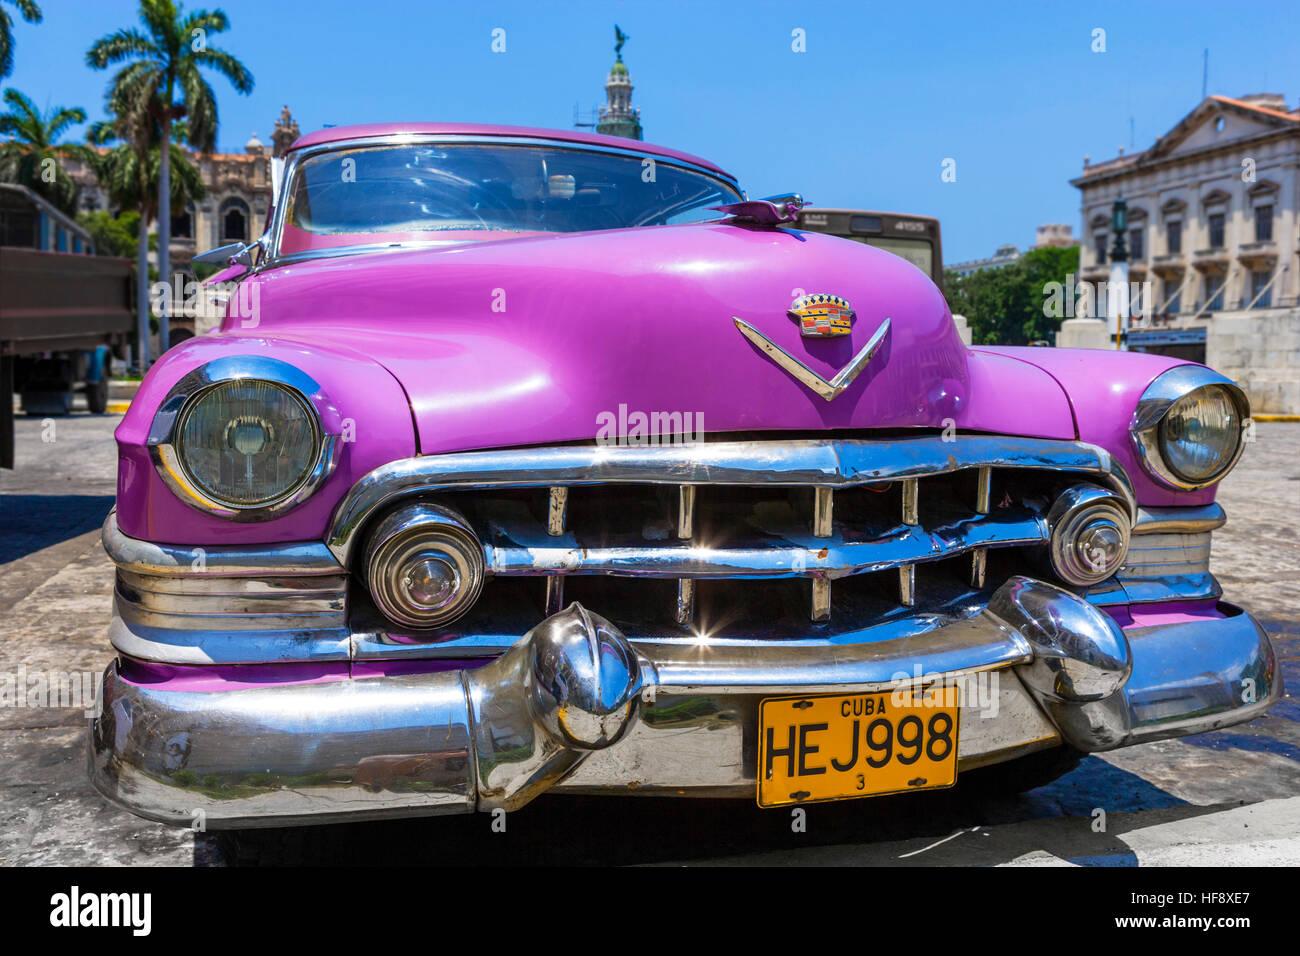 Cuba, Car. Old American Car in Havana, Cuba - Stock Image